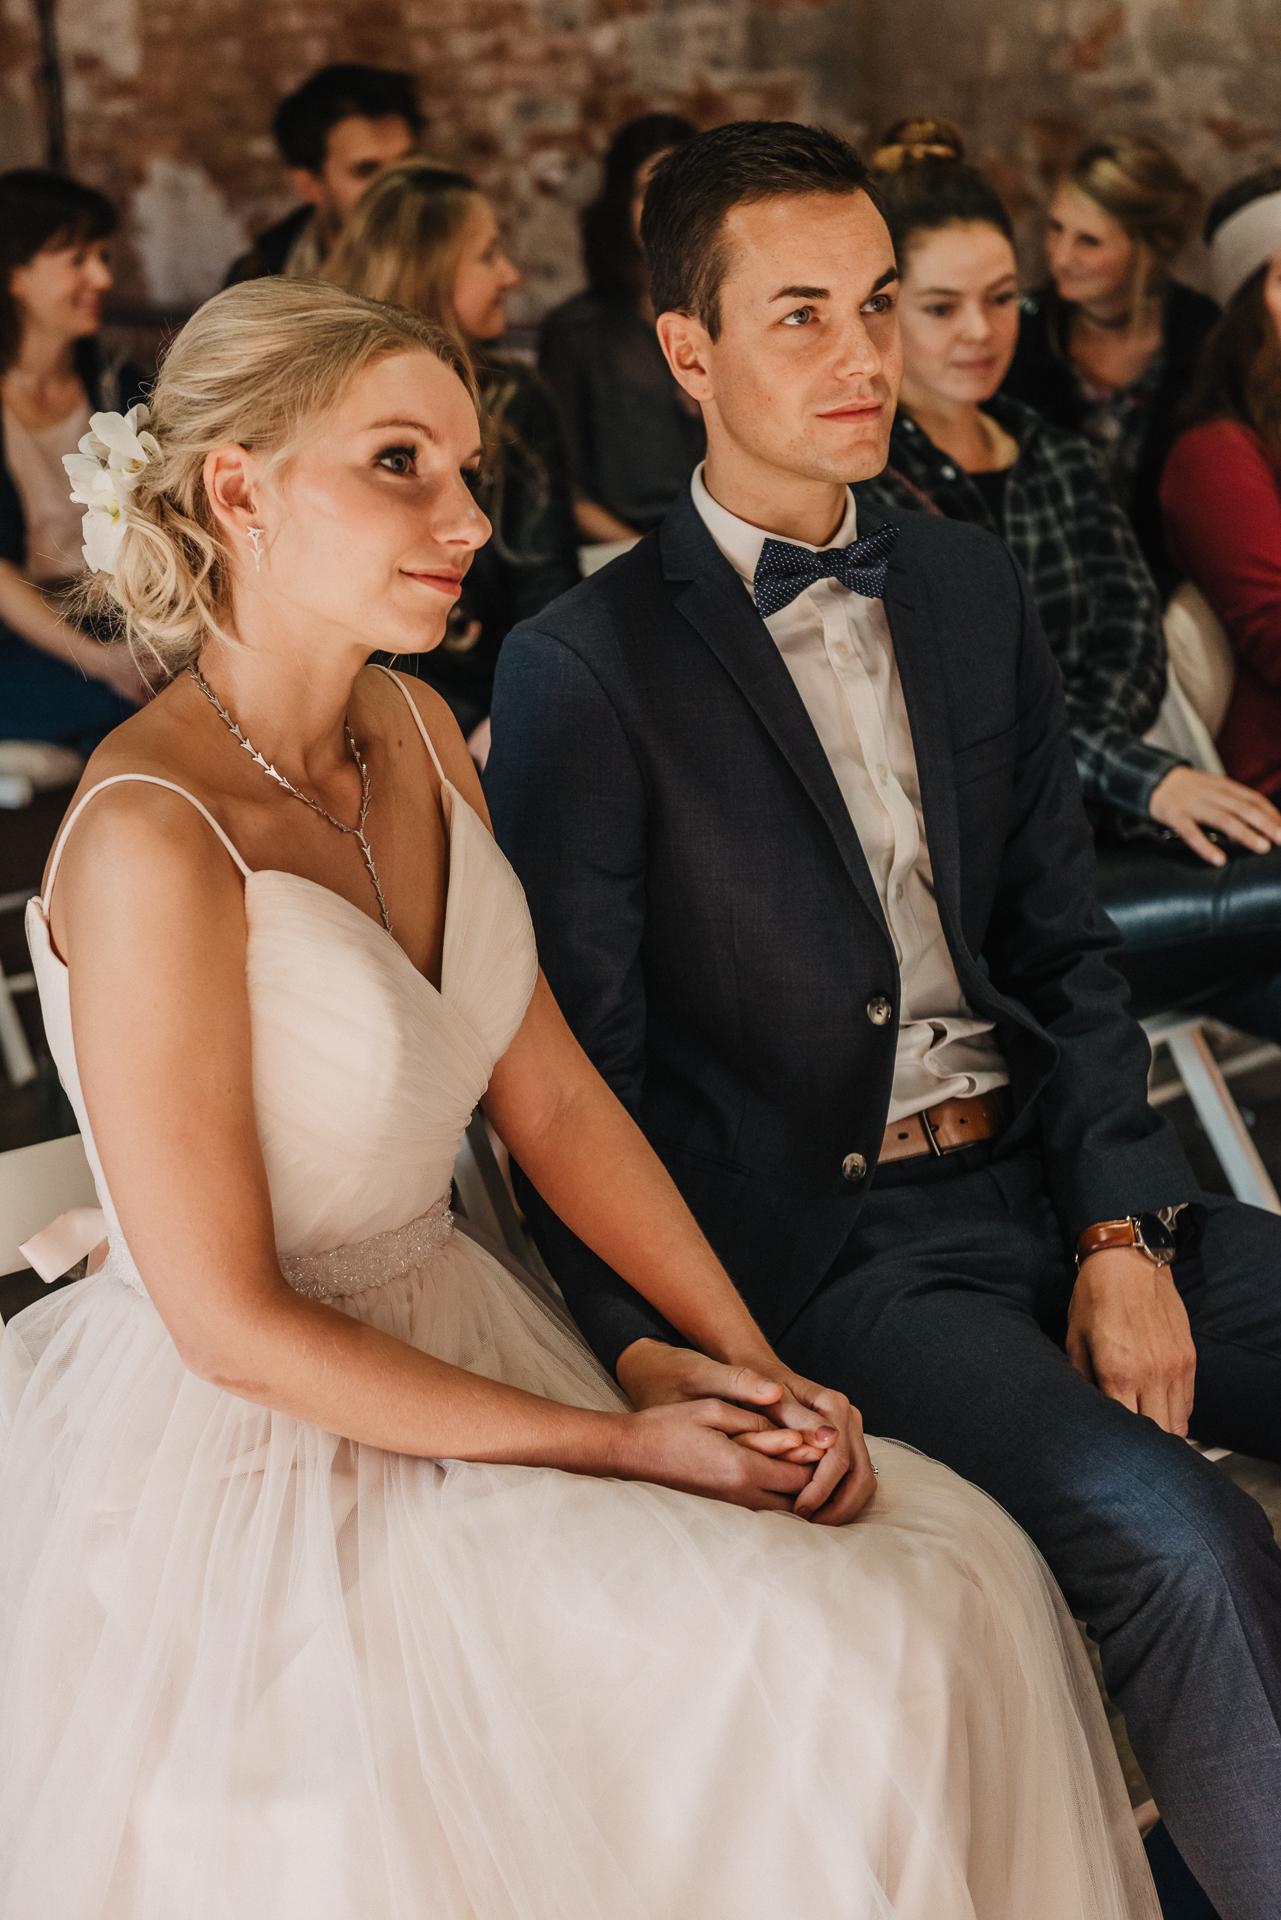 Zweinander-LeonoreHerzog-WeddingMarket-OnTour20191110-8980